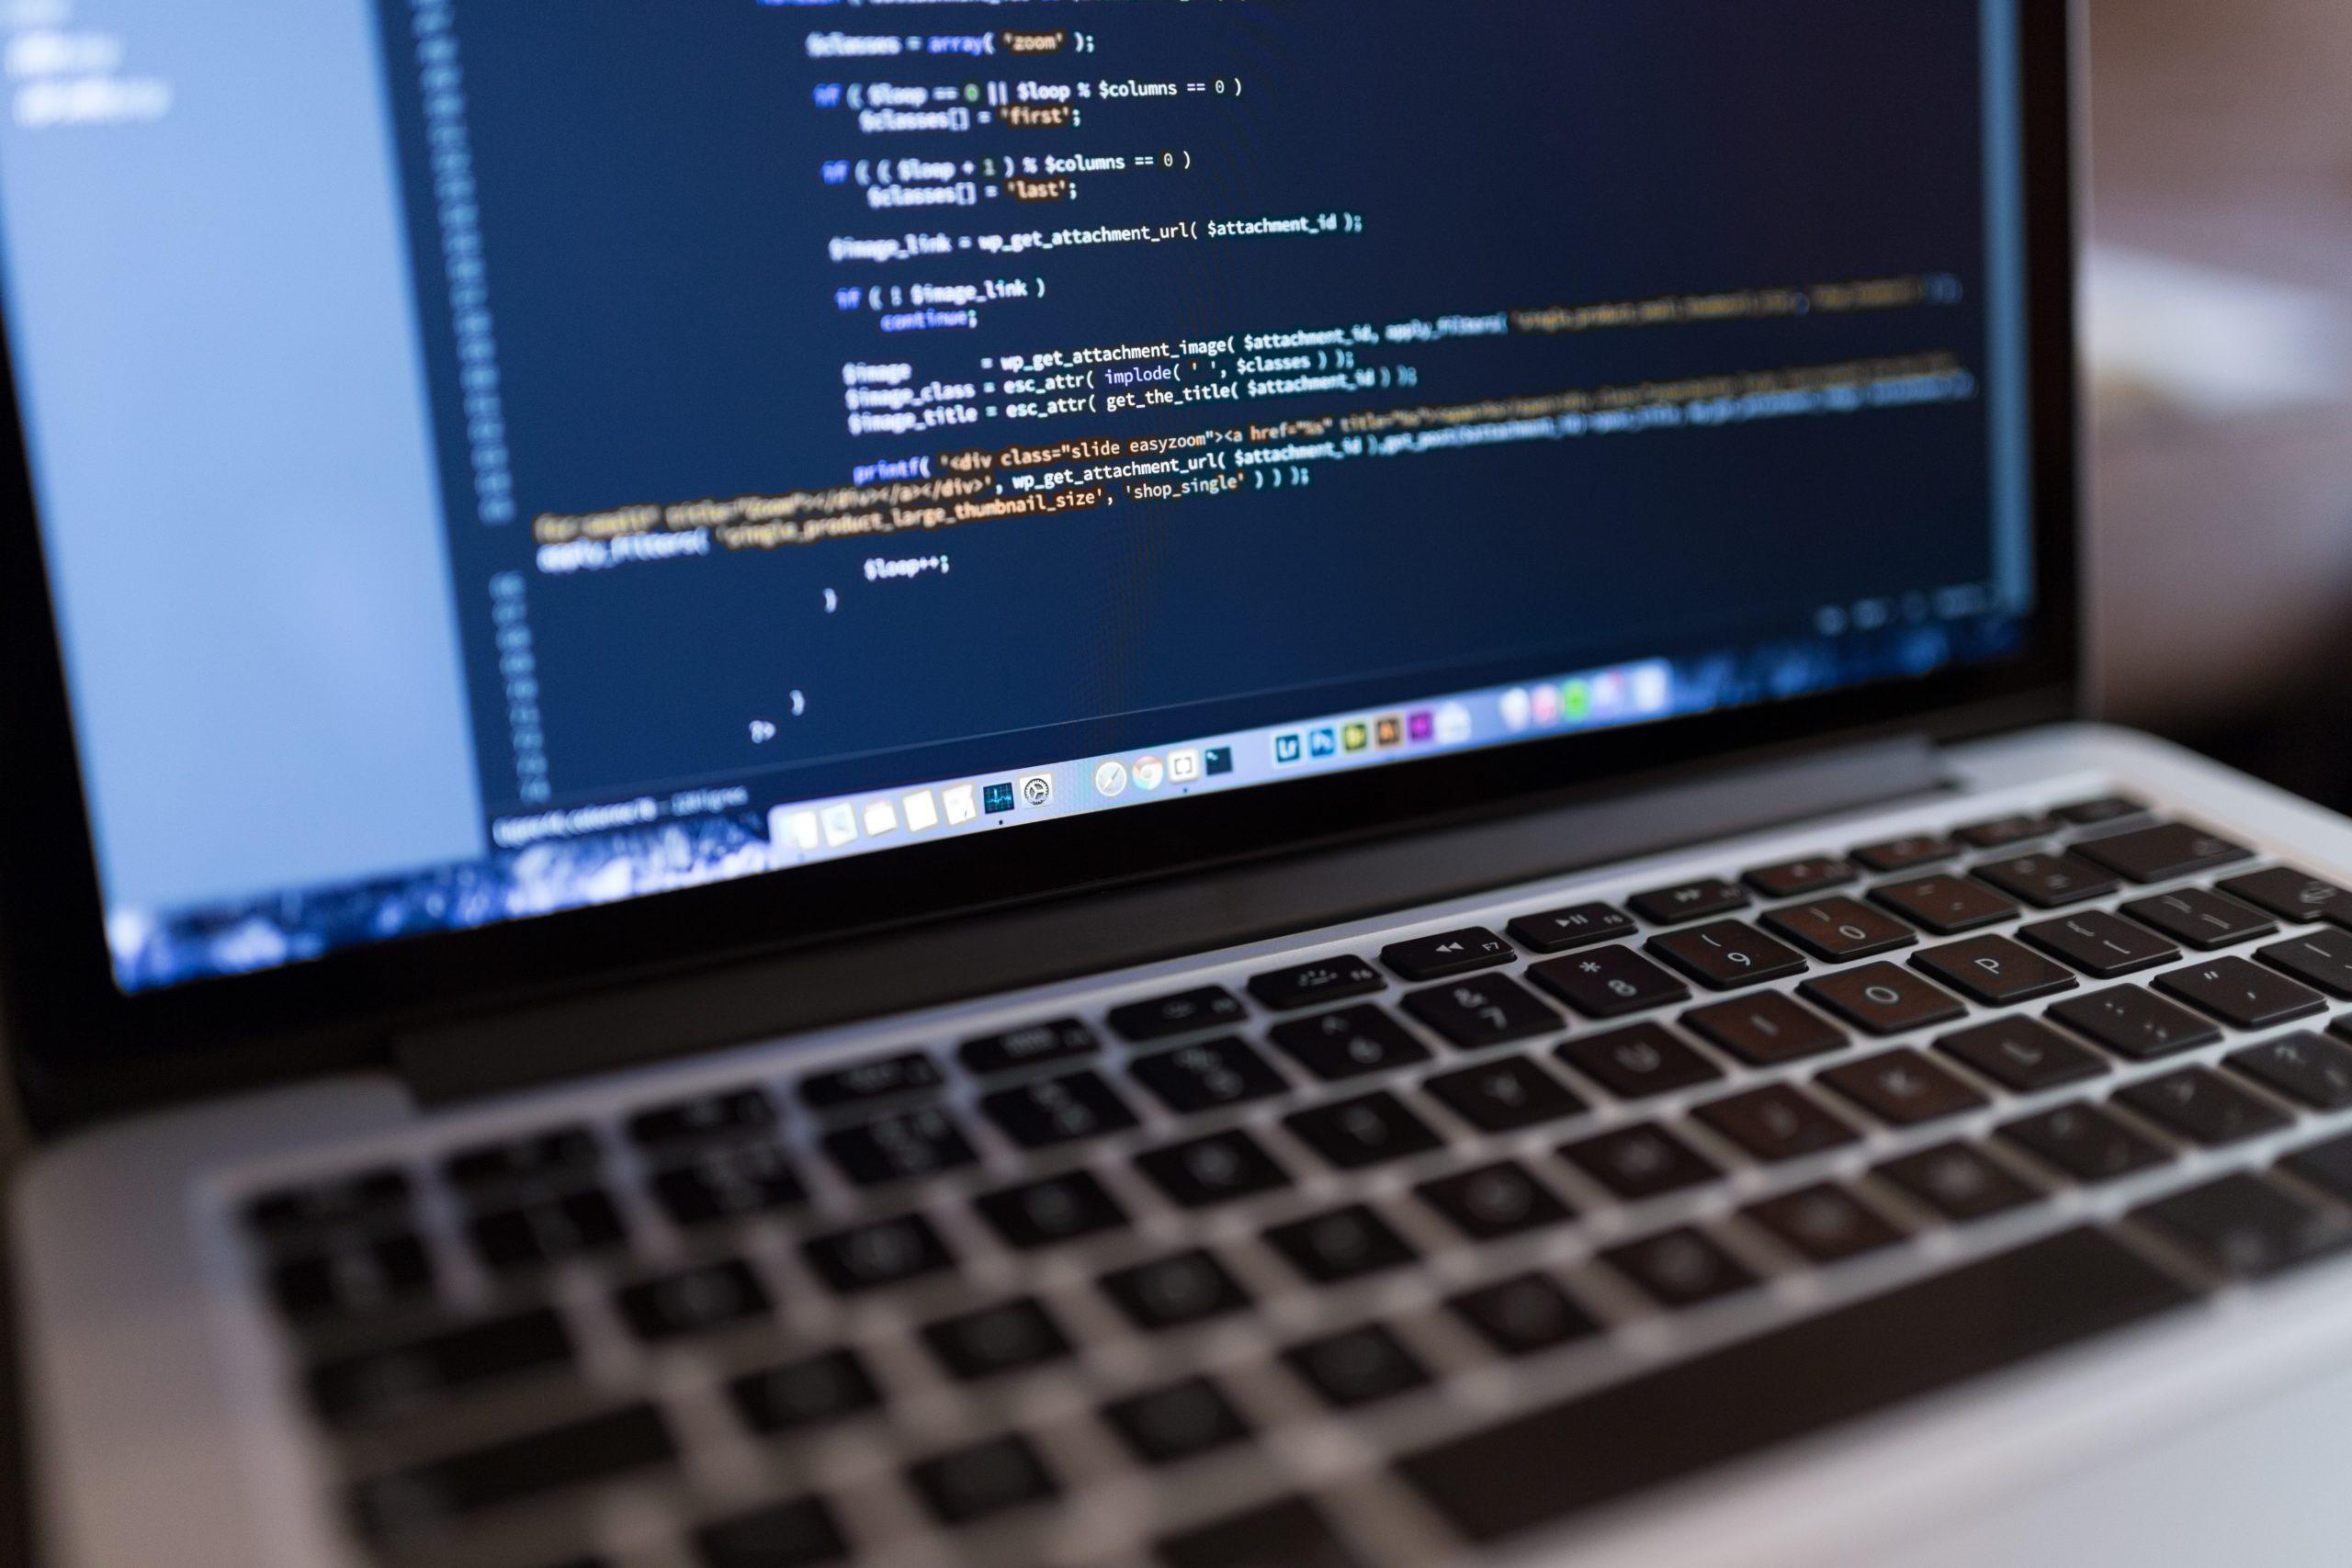 html displaying on computer screen